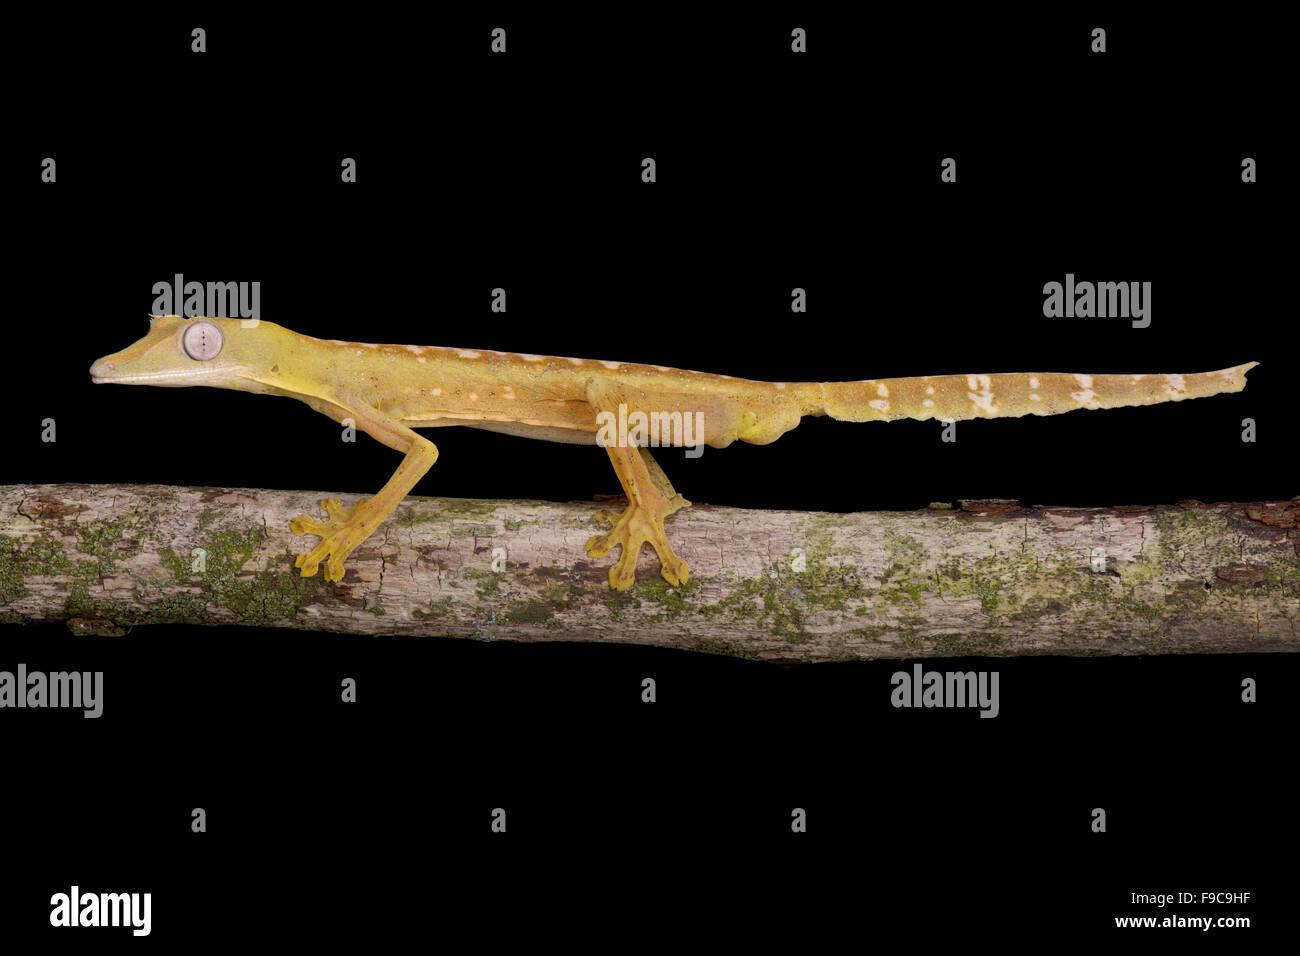 Forrado de cola plana (Gecko Uroplatus lineatus) Imagen De Stock